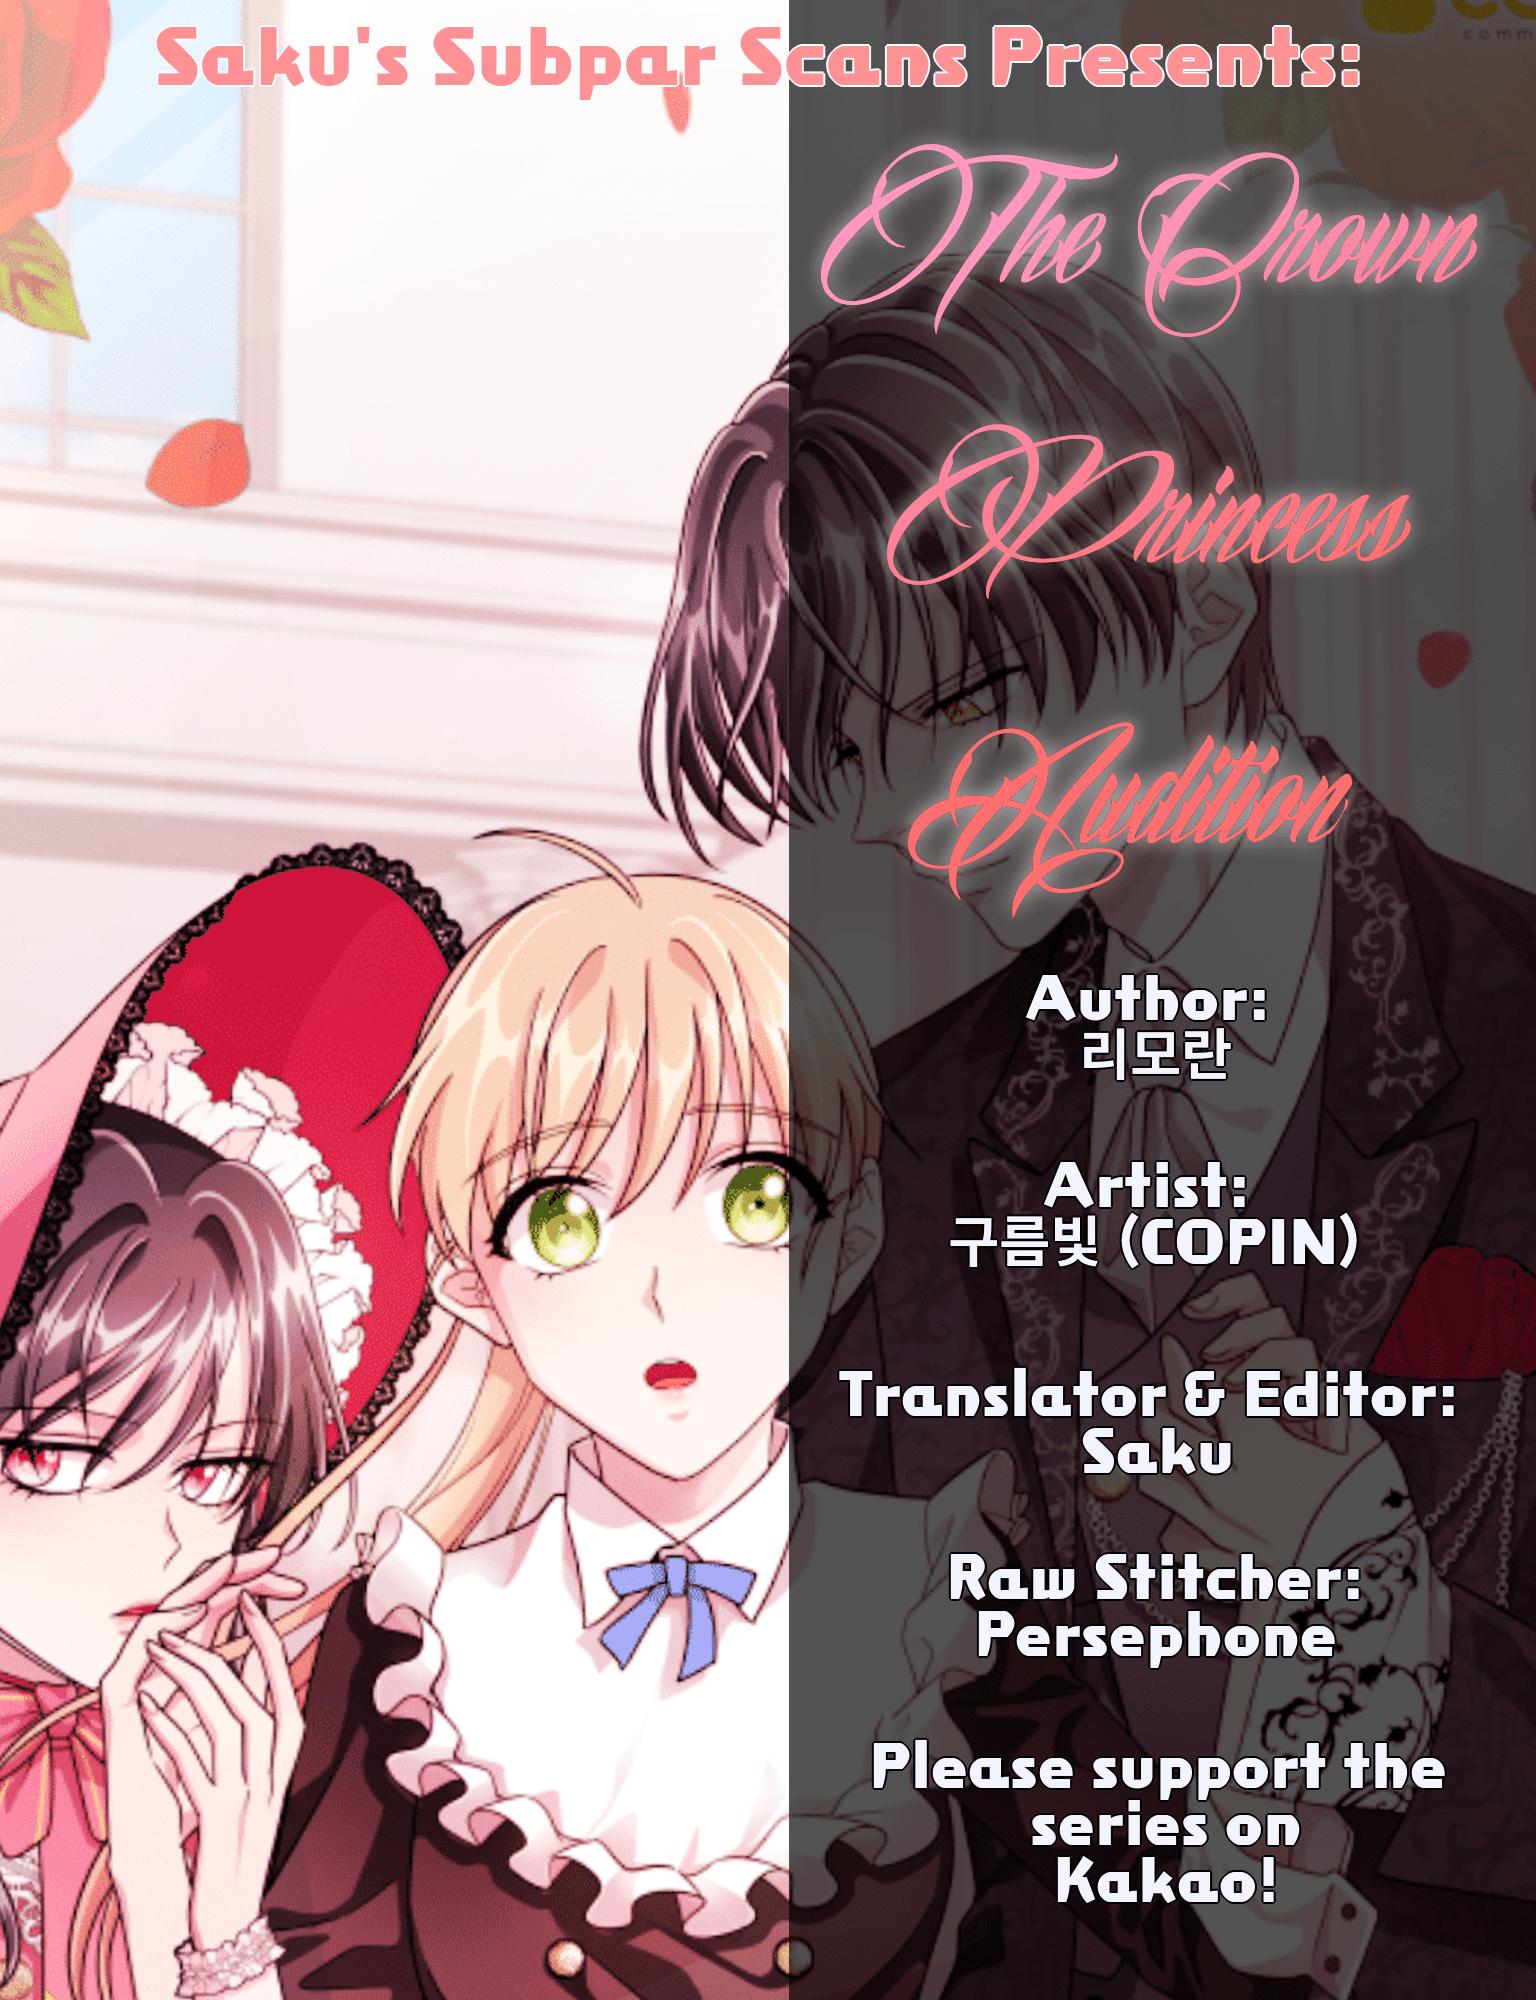 https://manga.mangadogs.com/comics/pic4/25/40345/2173481/3f3a6943c3ce919cd8a5ee810b459104.jpg Page 1